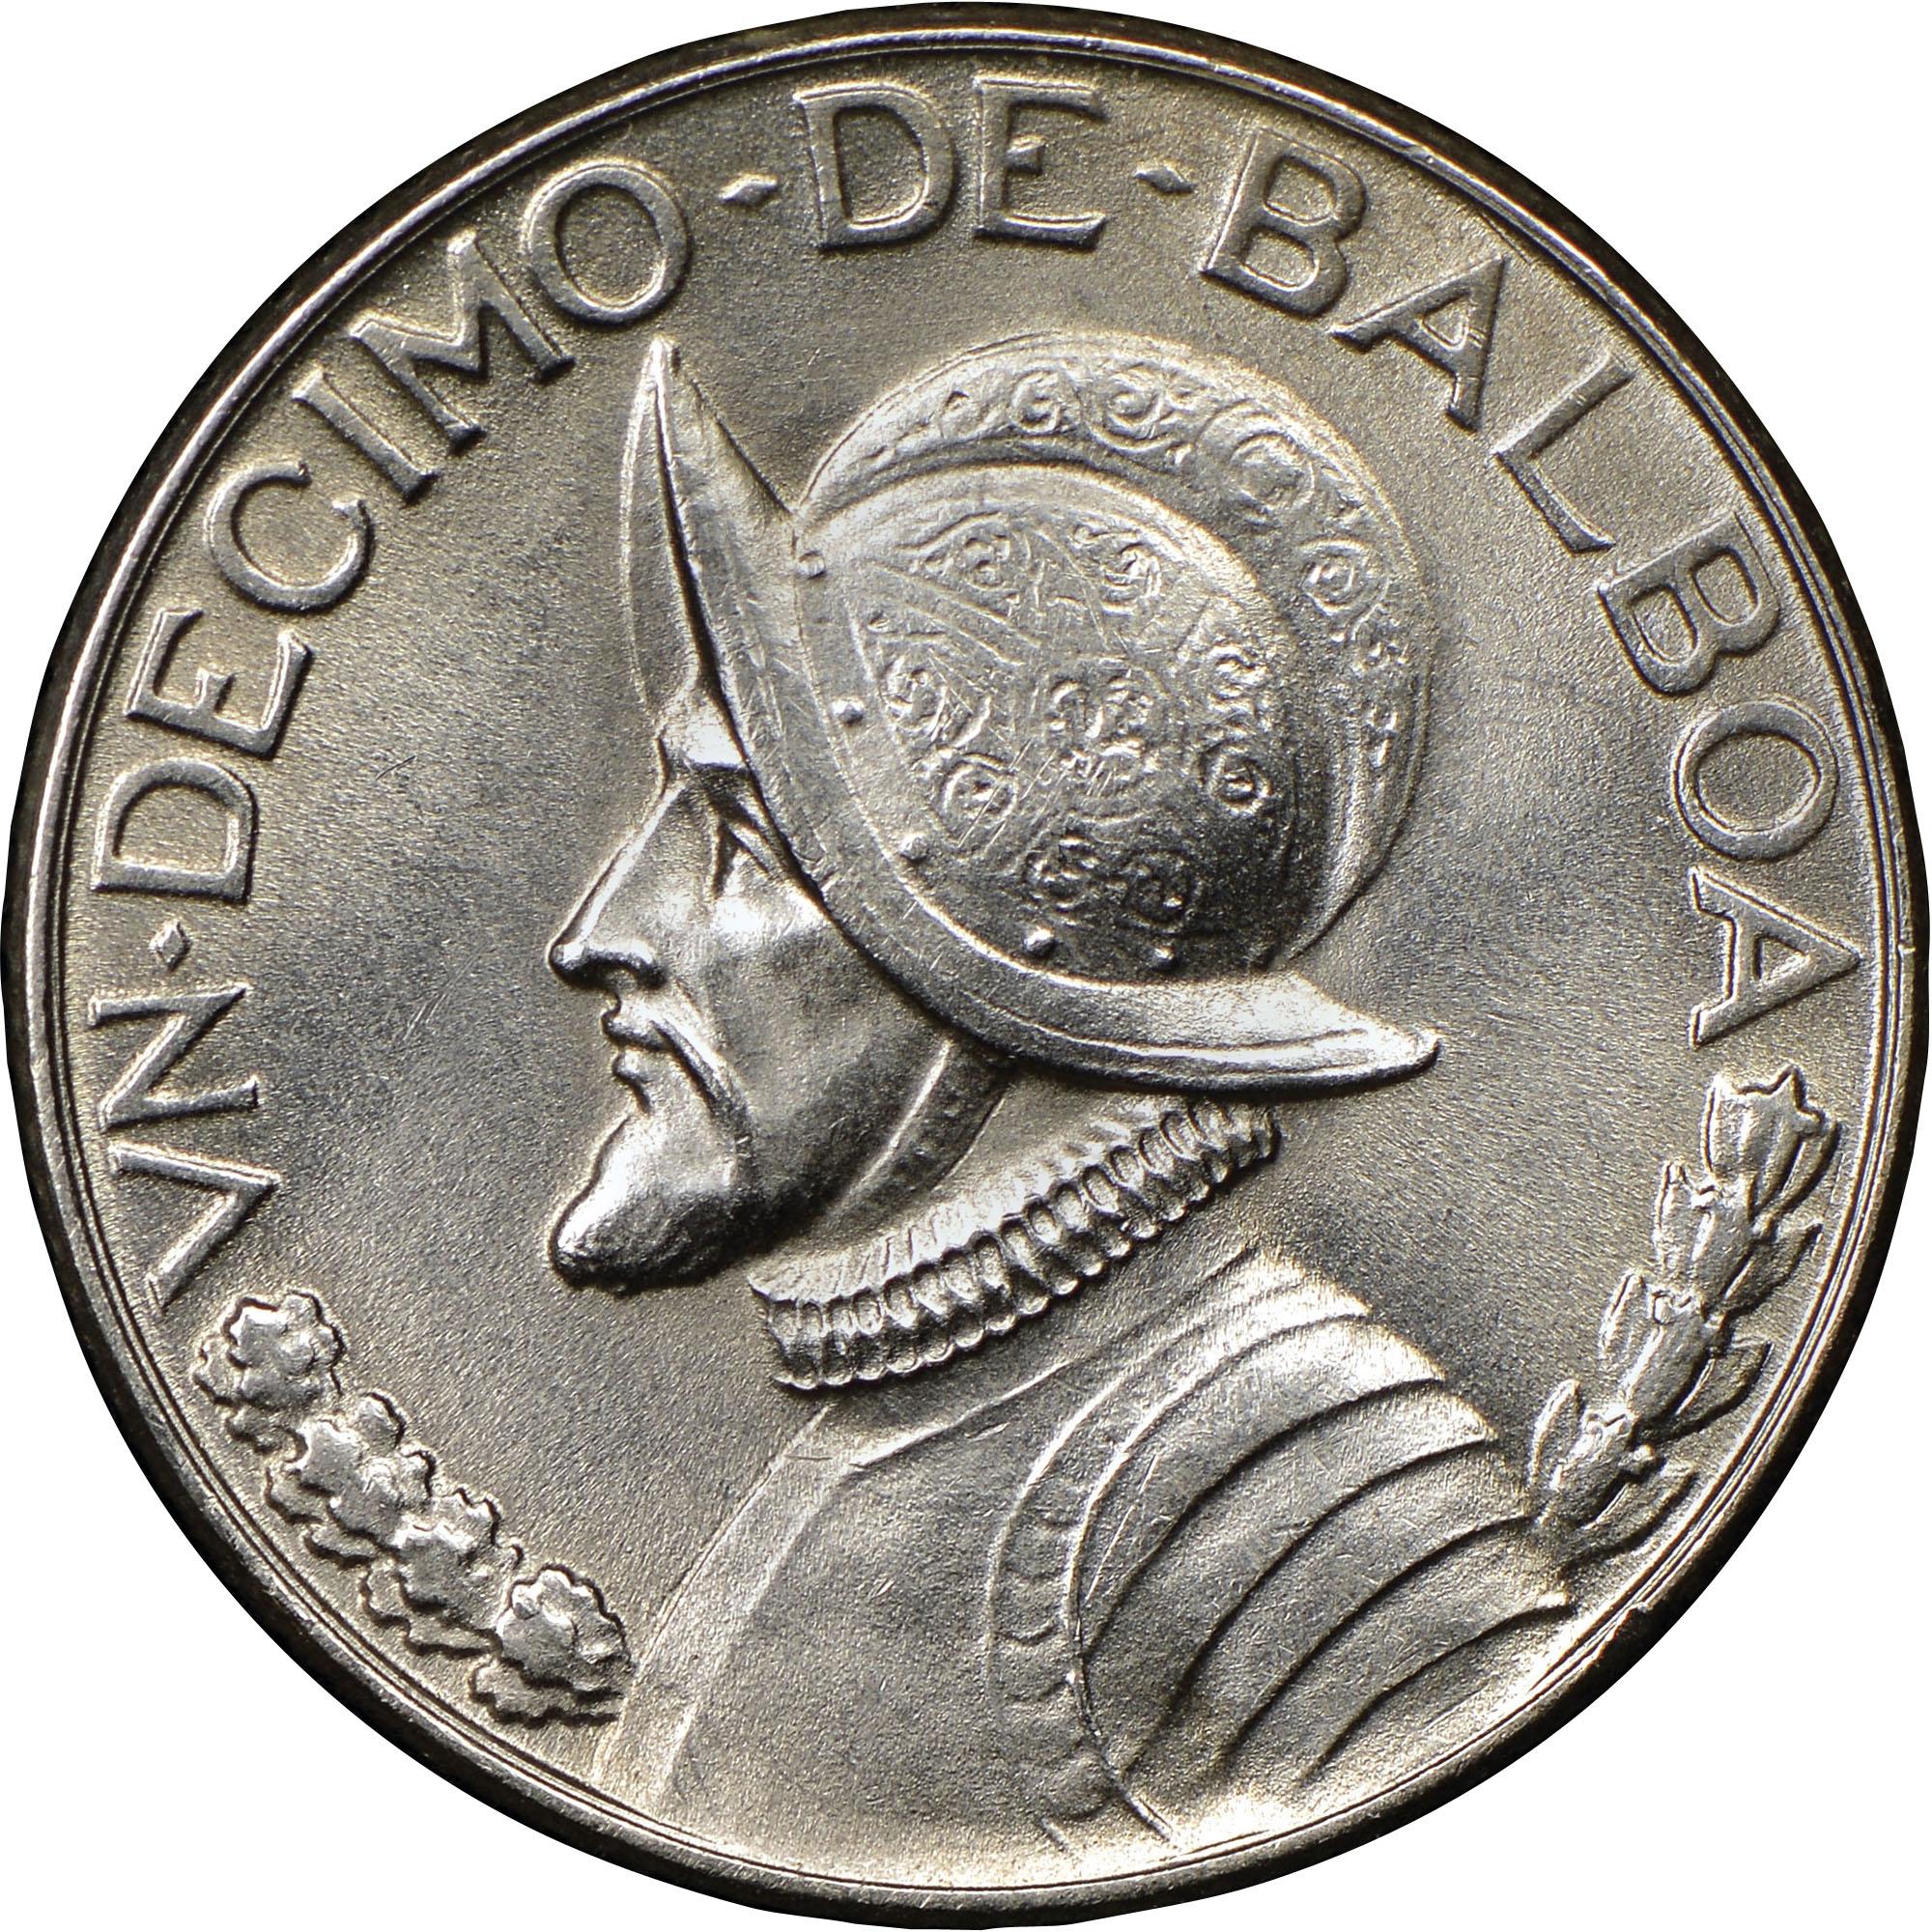 Panama 1 10 Balboa Km 10 1 Prices Amp Values Ngc